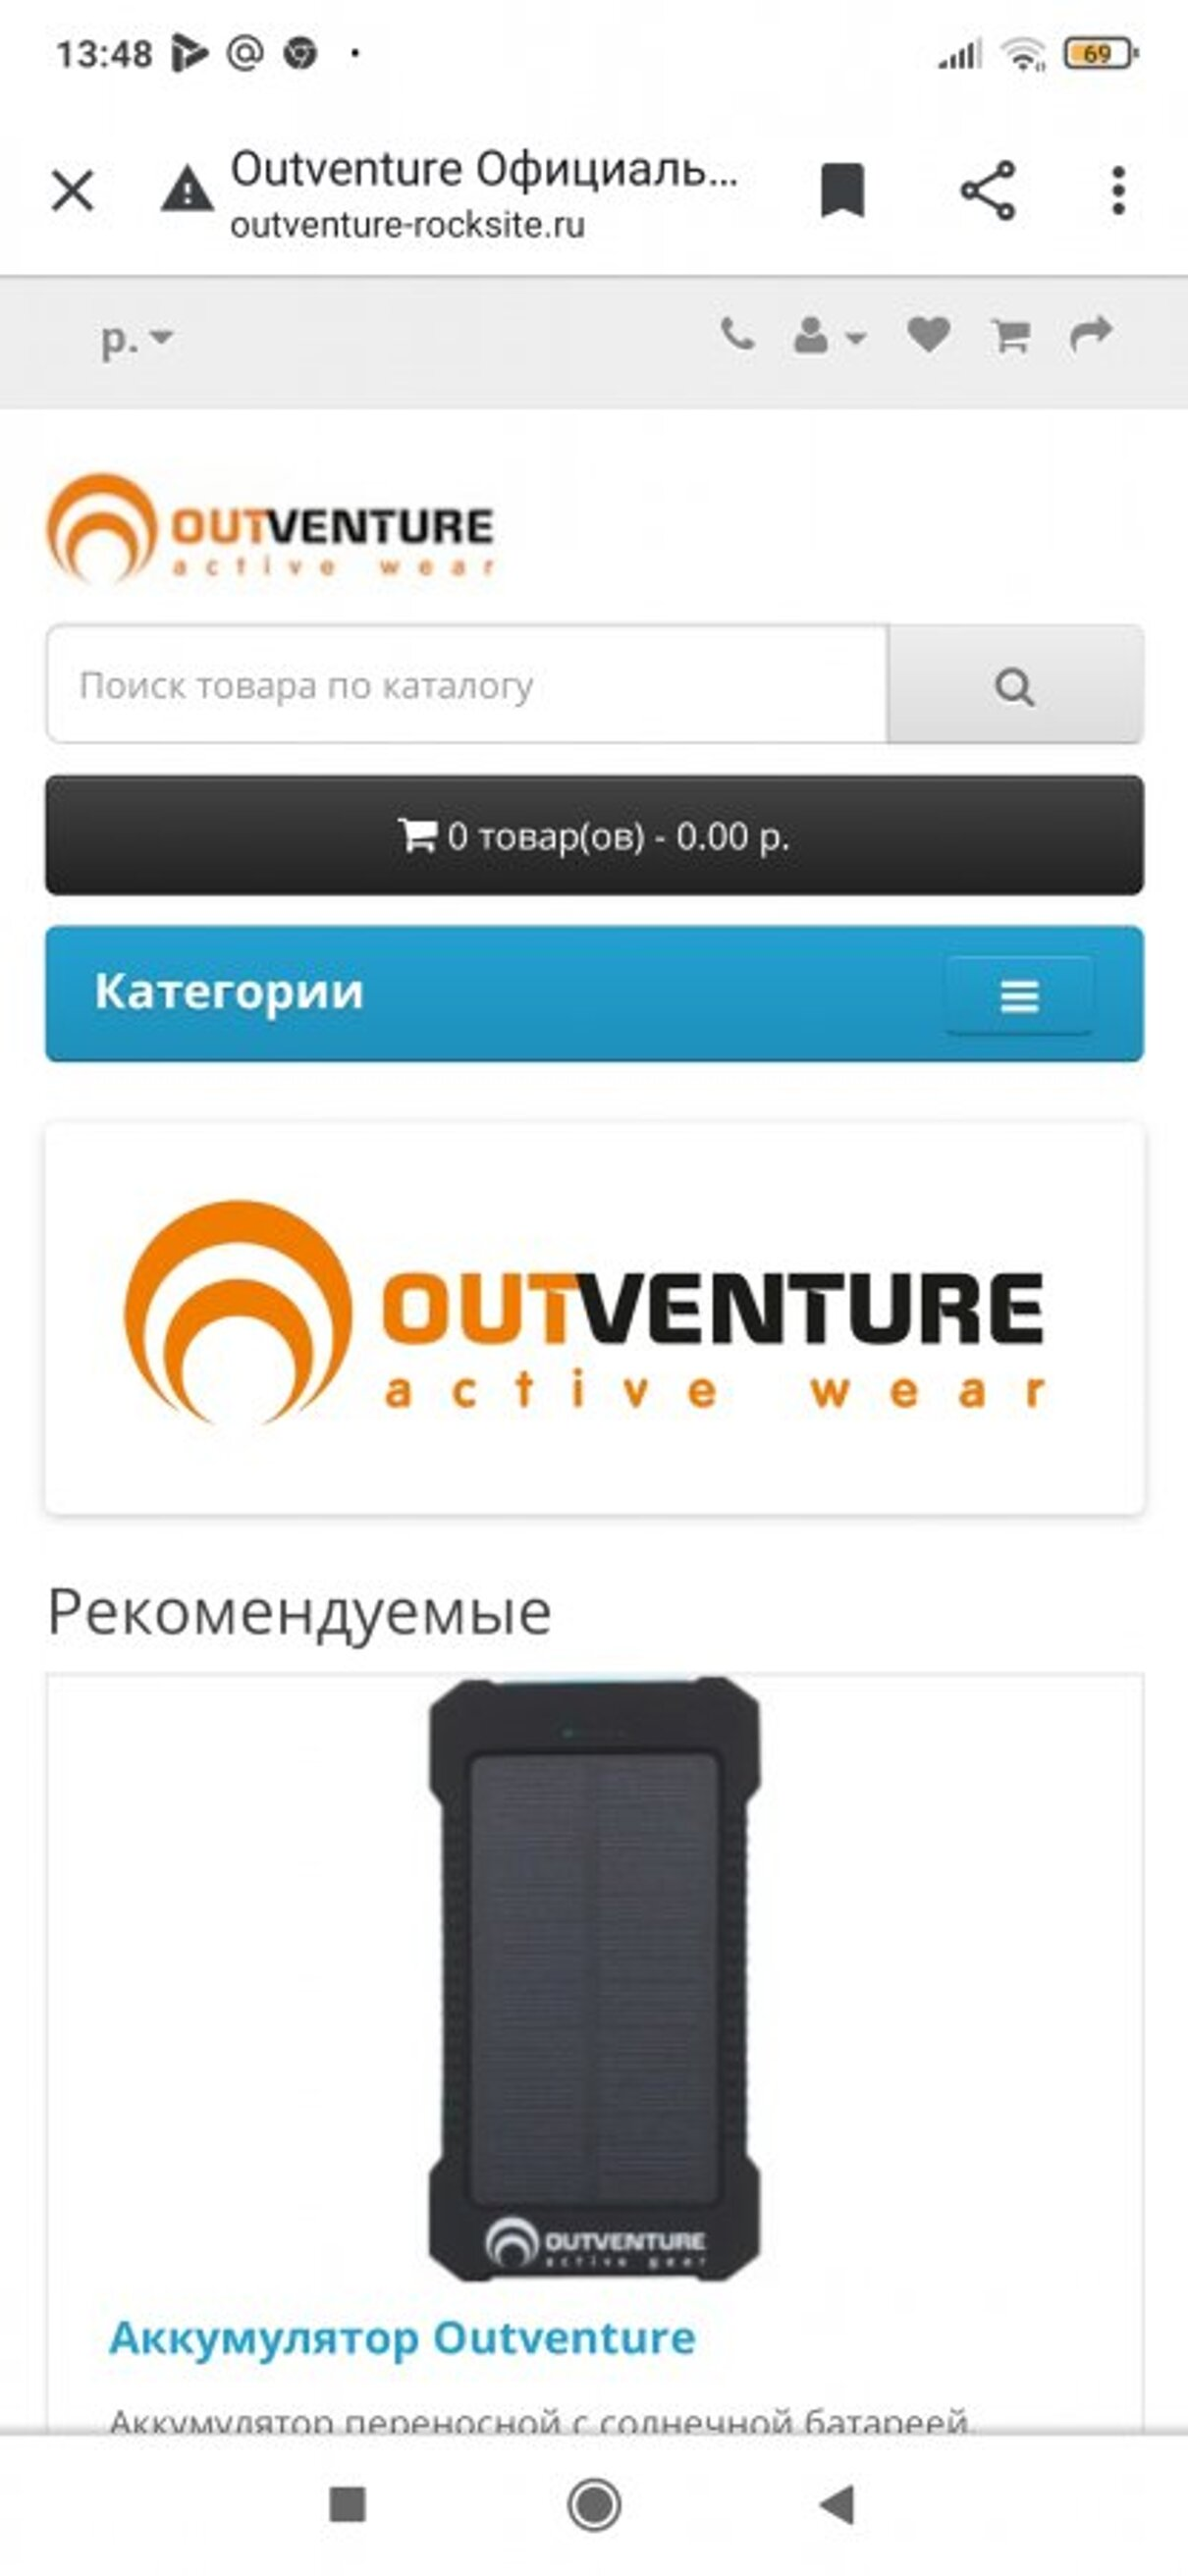 Жалоба-отзыв: Http://outventure-rocksite.ru - Ворье, фейк, левый магазин